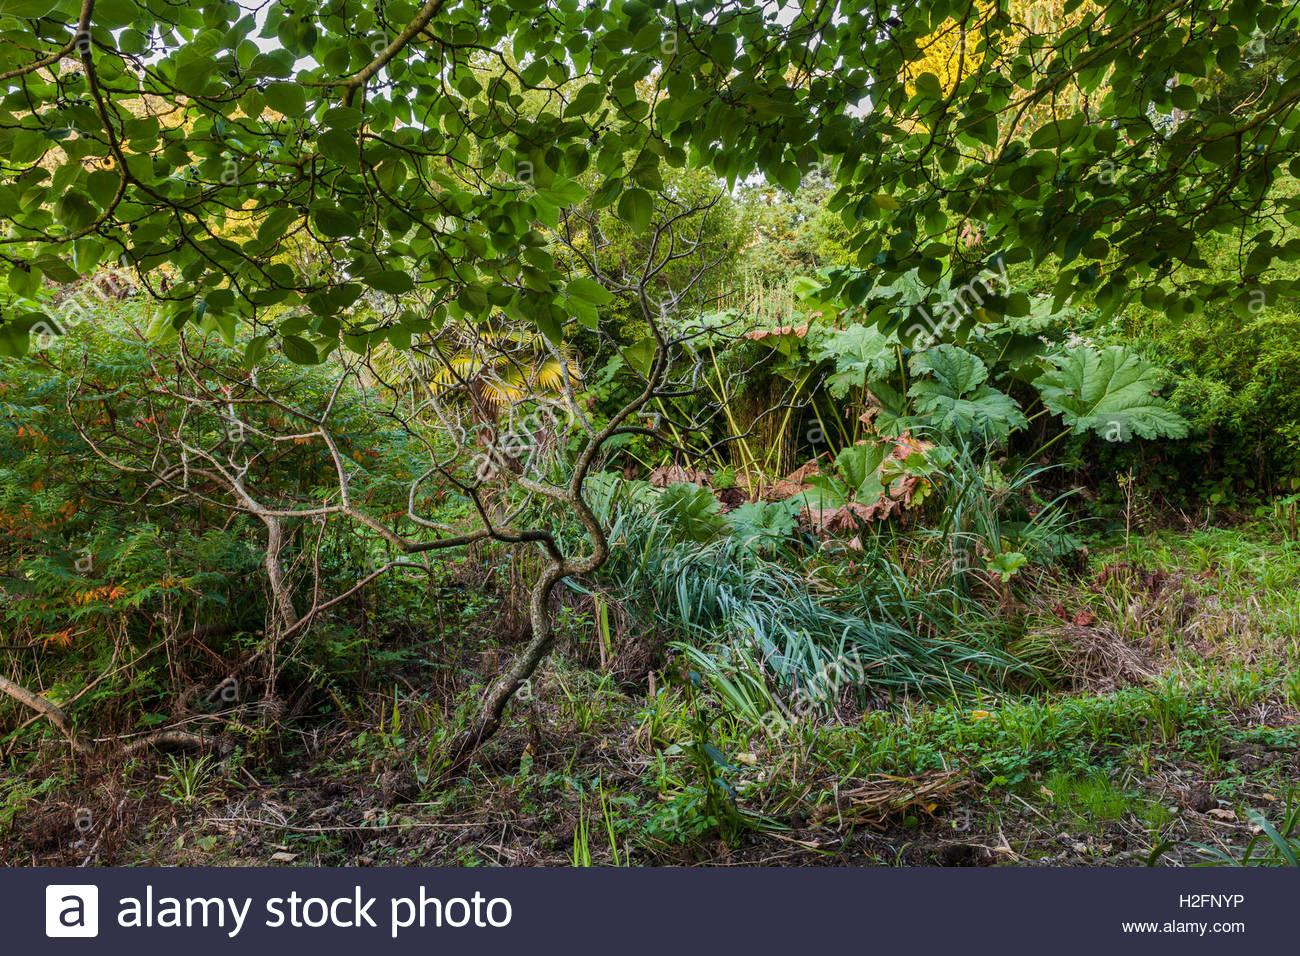 garden overgrown neglected - Stock Image